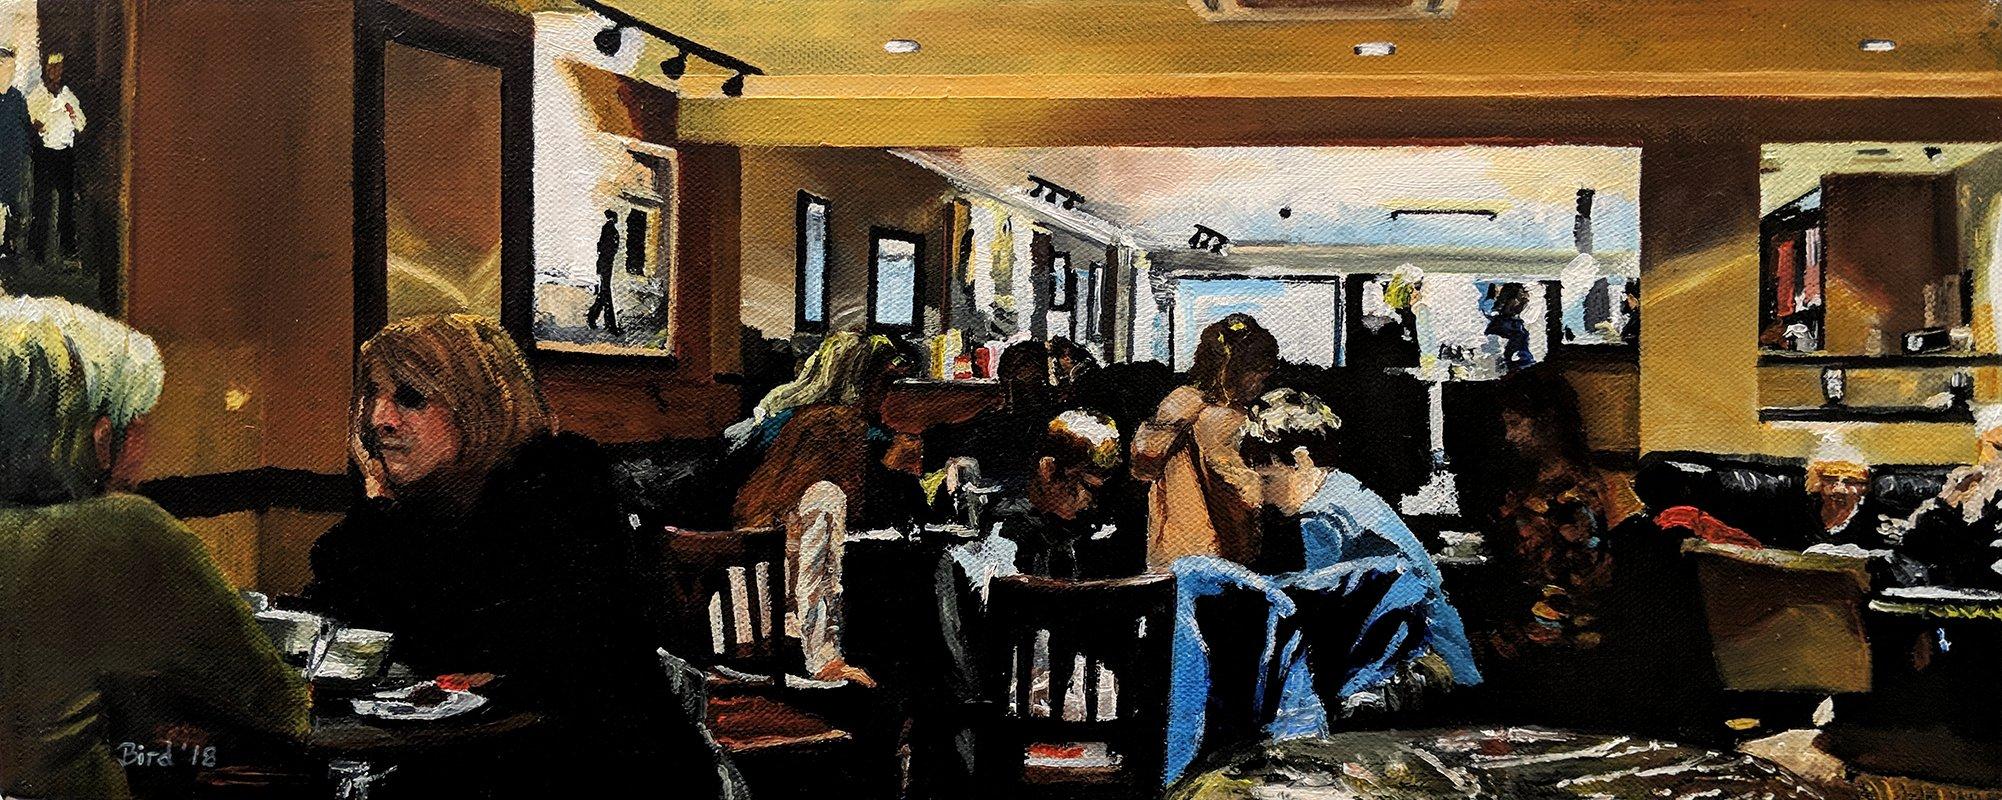 Café Nero, Nantwich